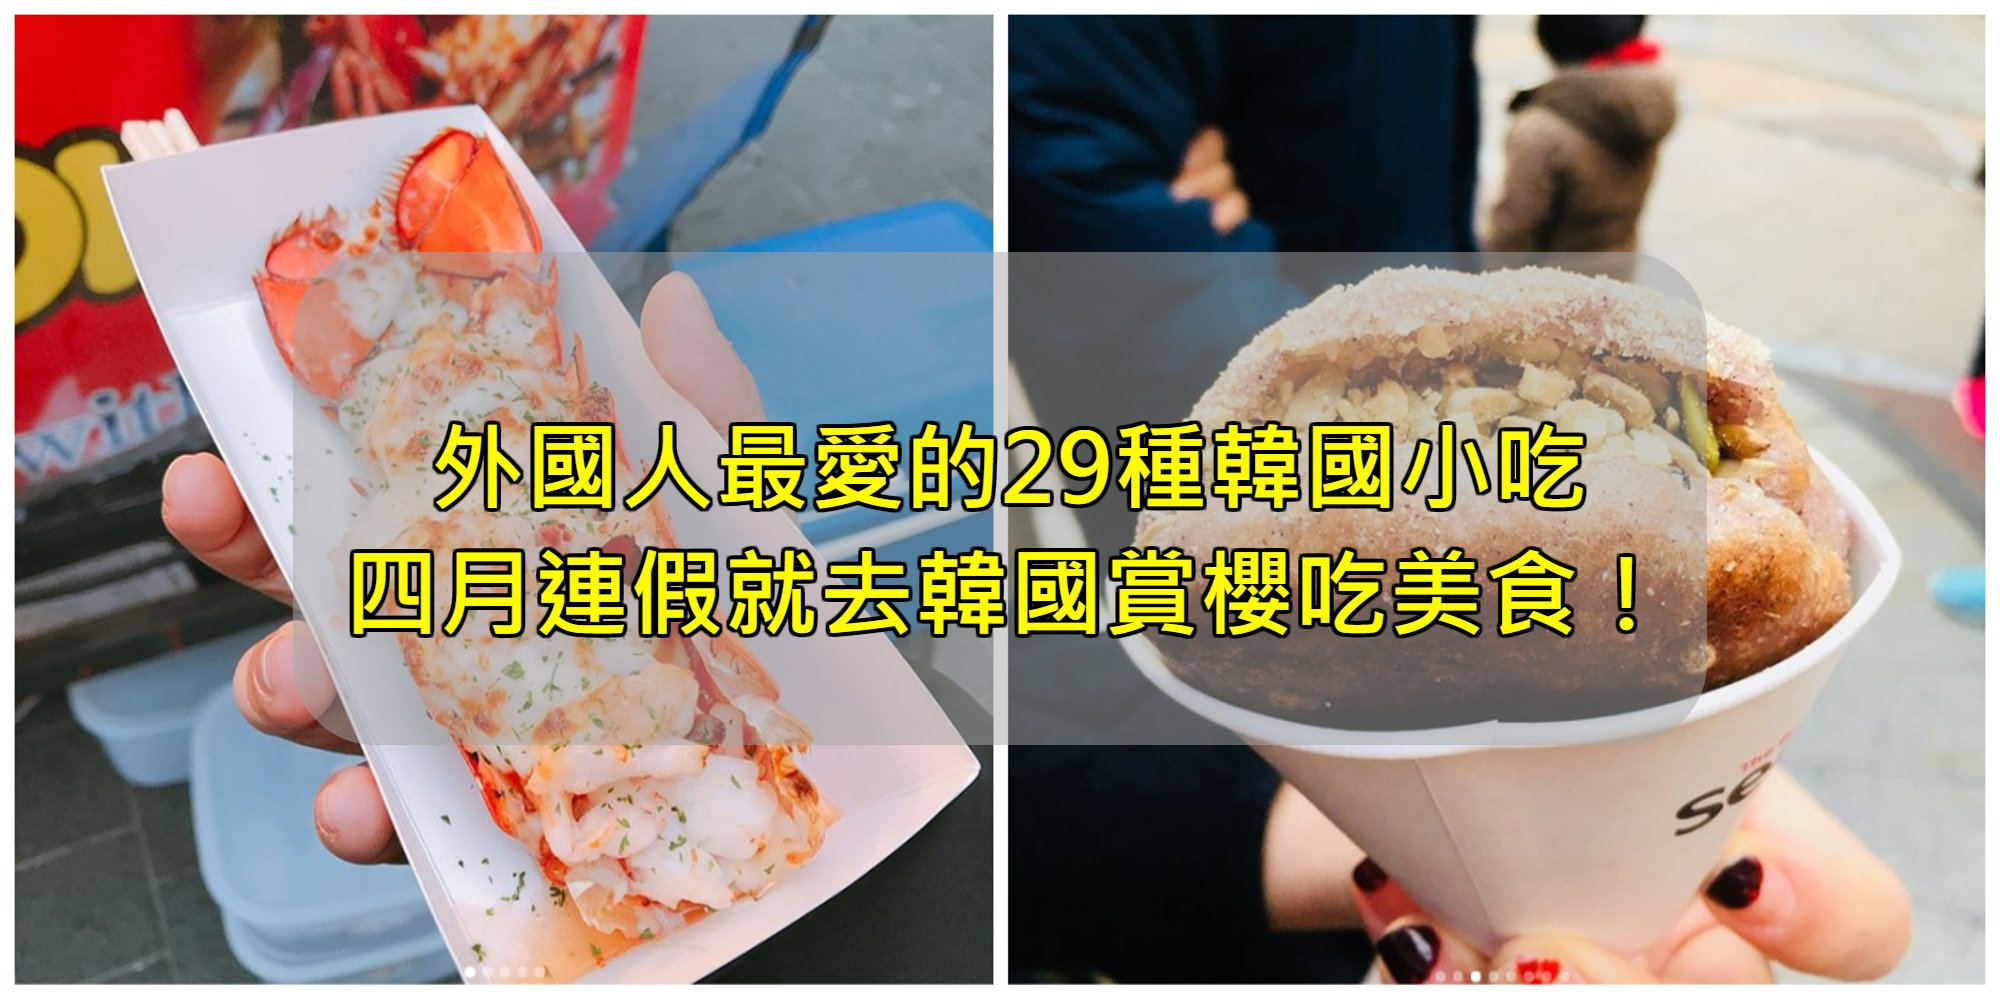 e59c96e789871.png?resize=1200,630 - 新亞洲美食王國?外國人認證29種神好吃的韓國街頭美食大盤點!